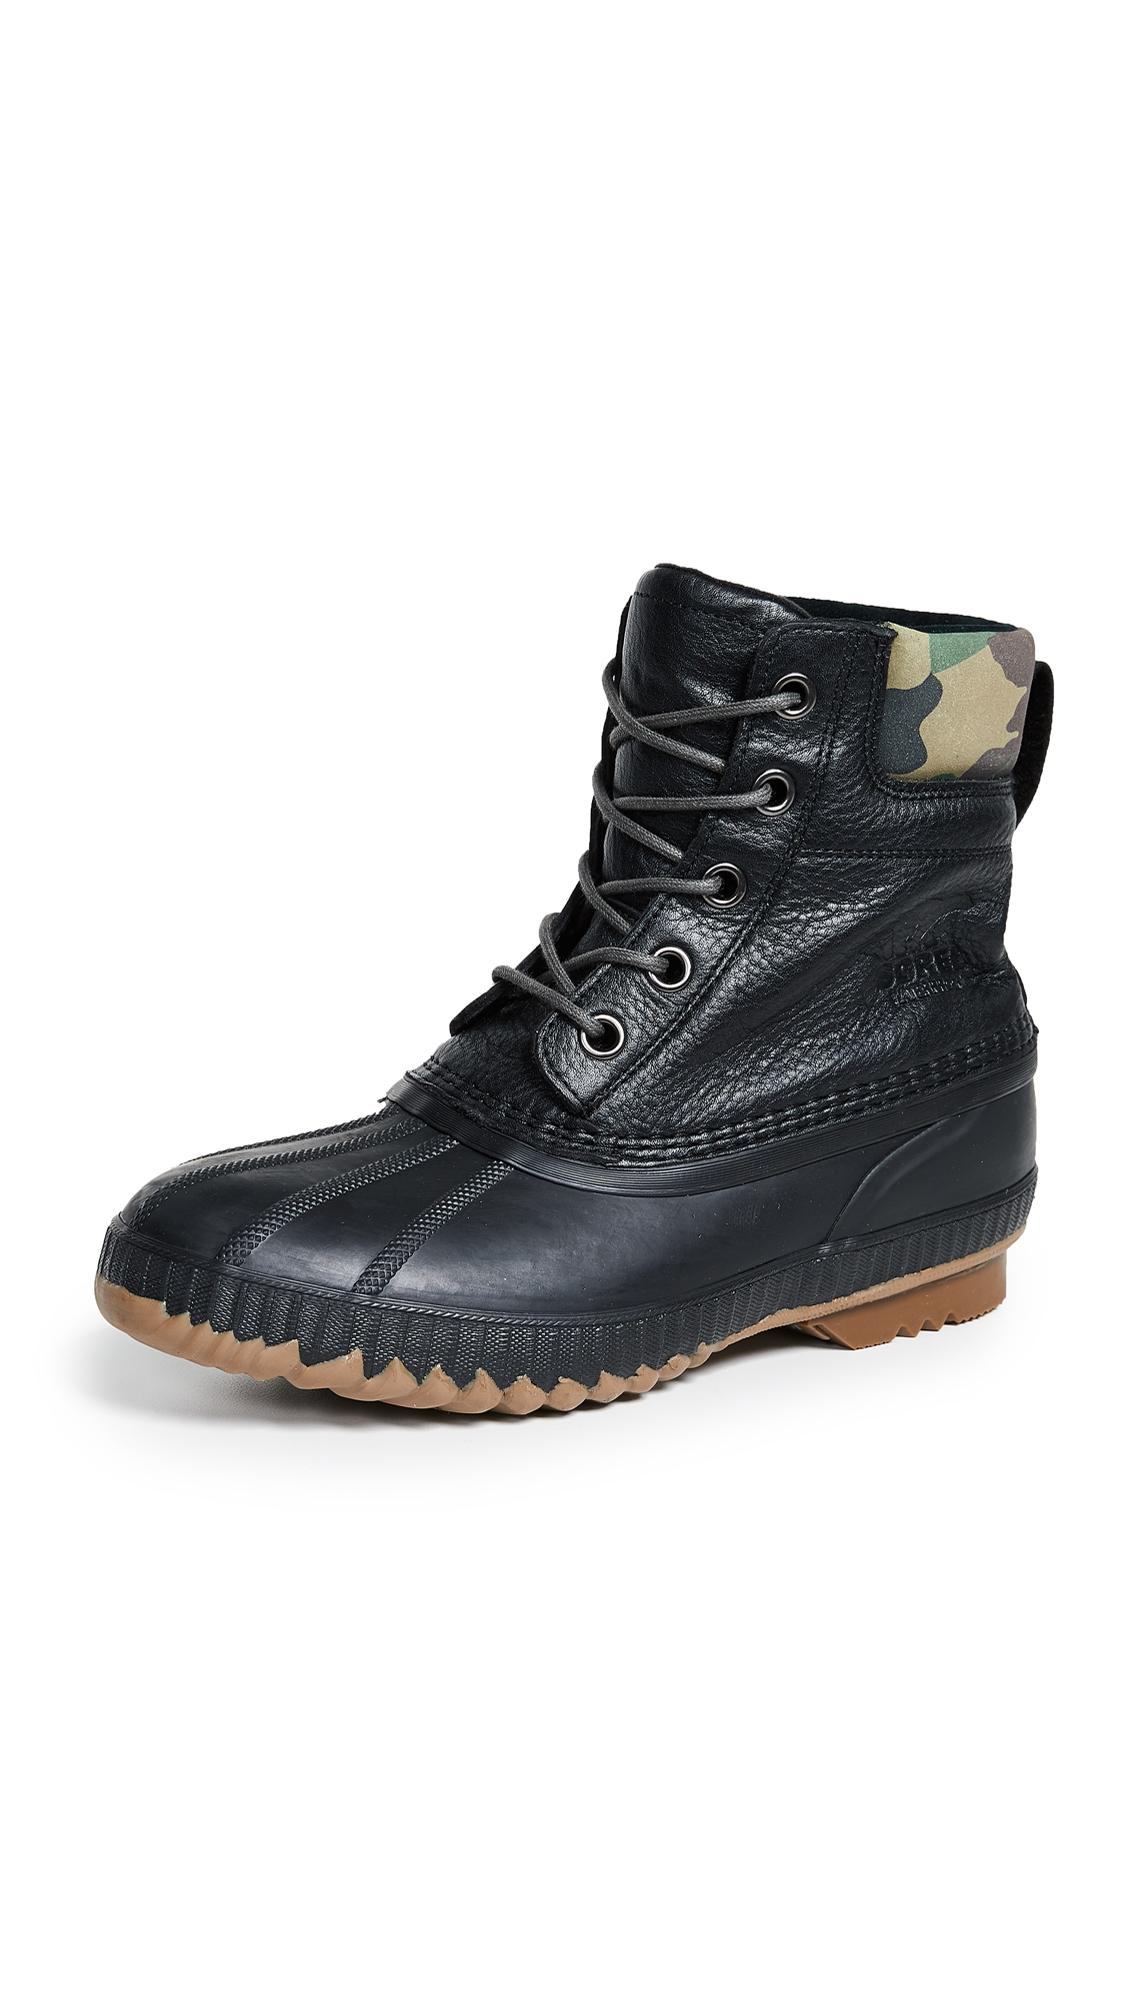 68eb6694352 Cheyanne Ii Premium Camo Hiking Boots in Black/Alpine